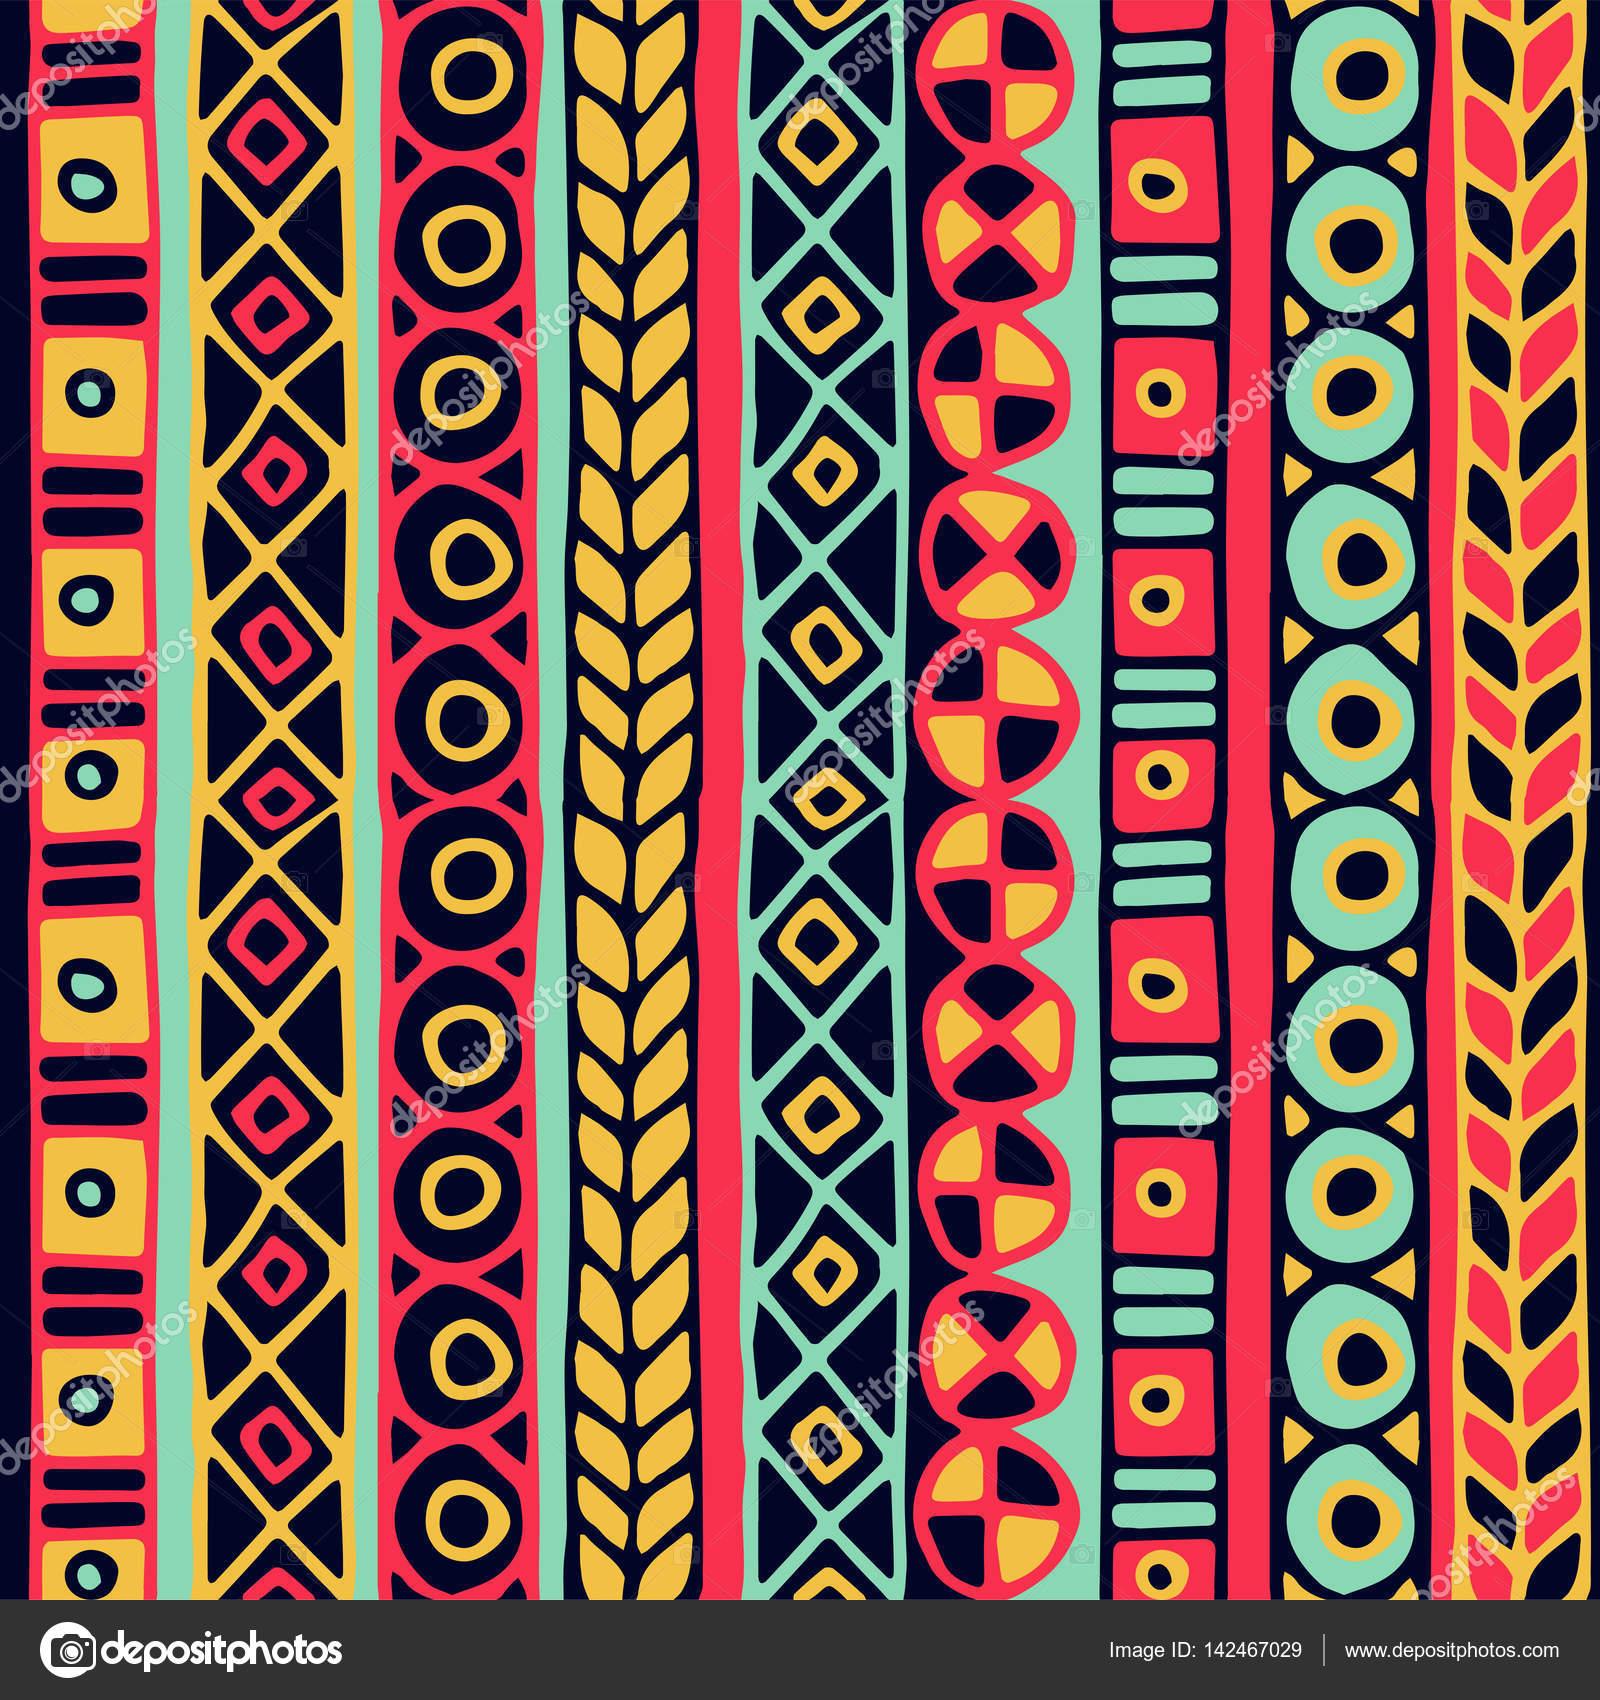 Ethnicity Wallpaper Ethnicity Seamless Pattern Boho Style